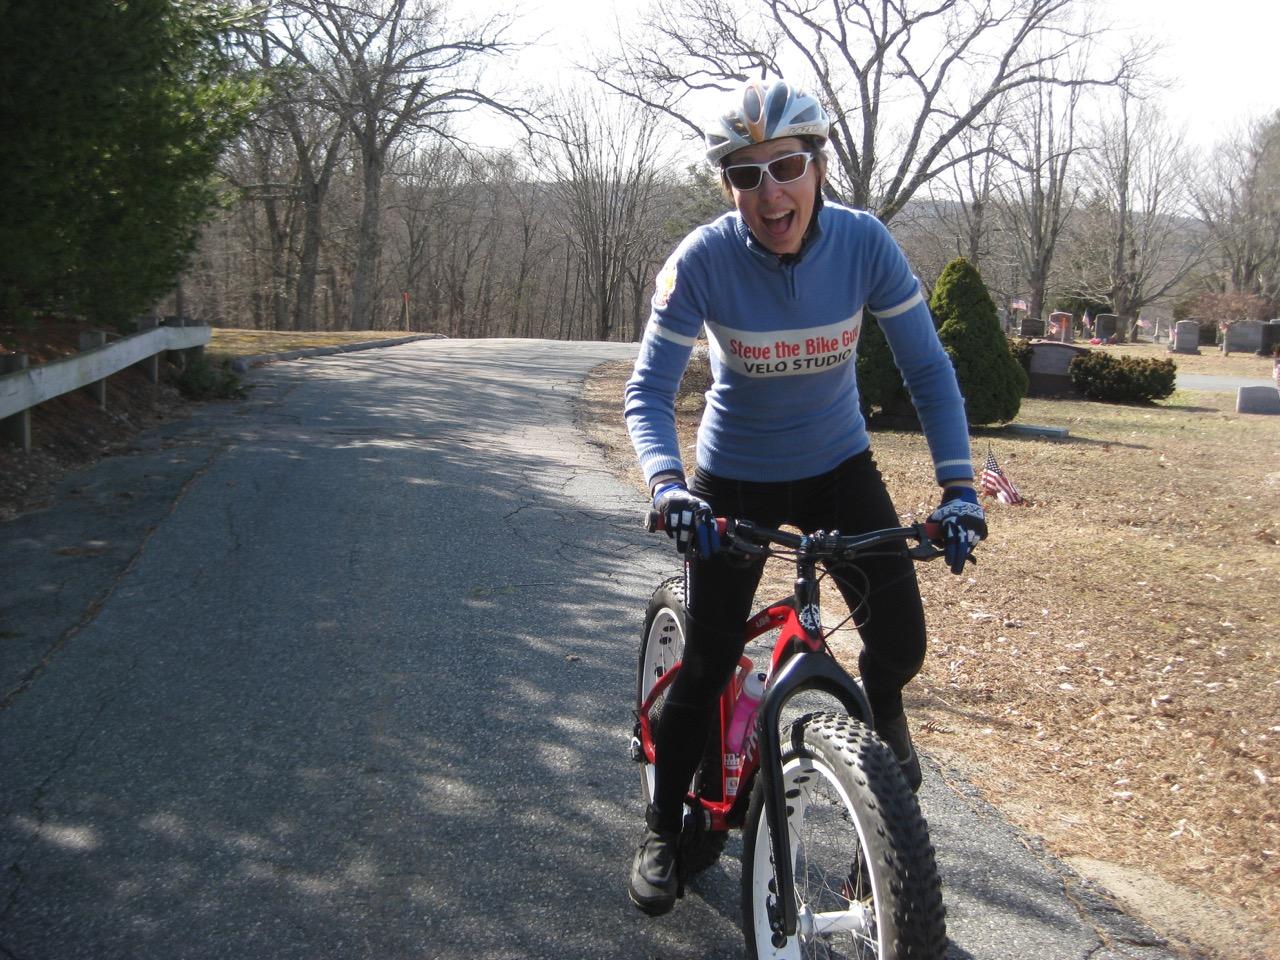 Pushing my bike like Wilma Flinstone